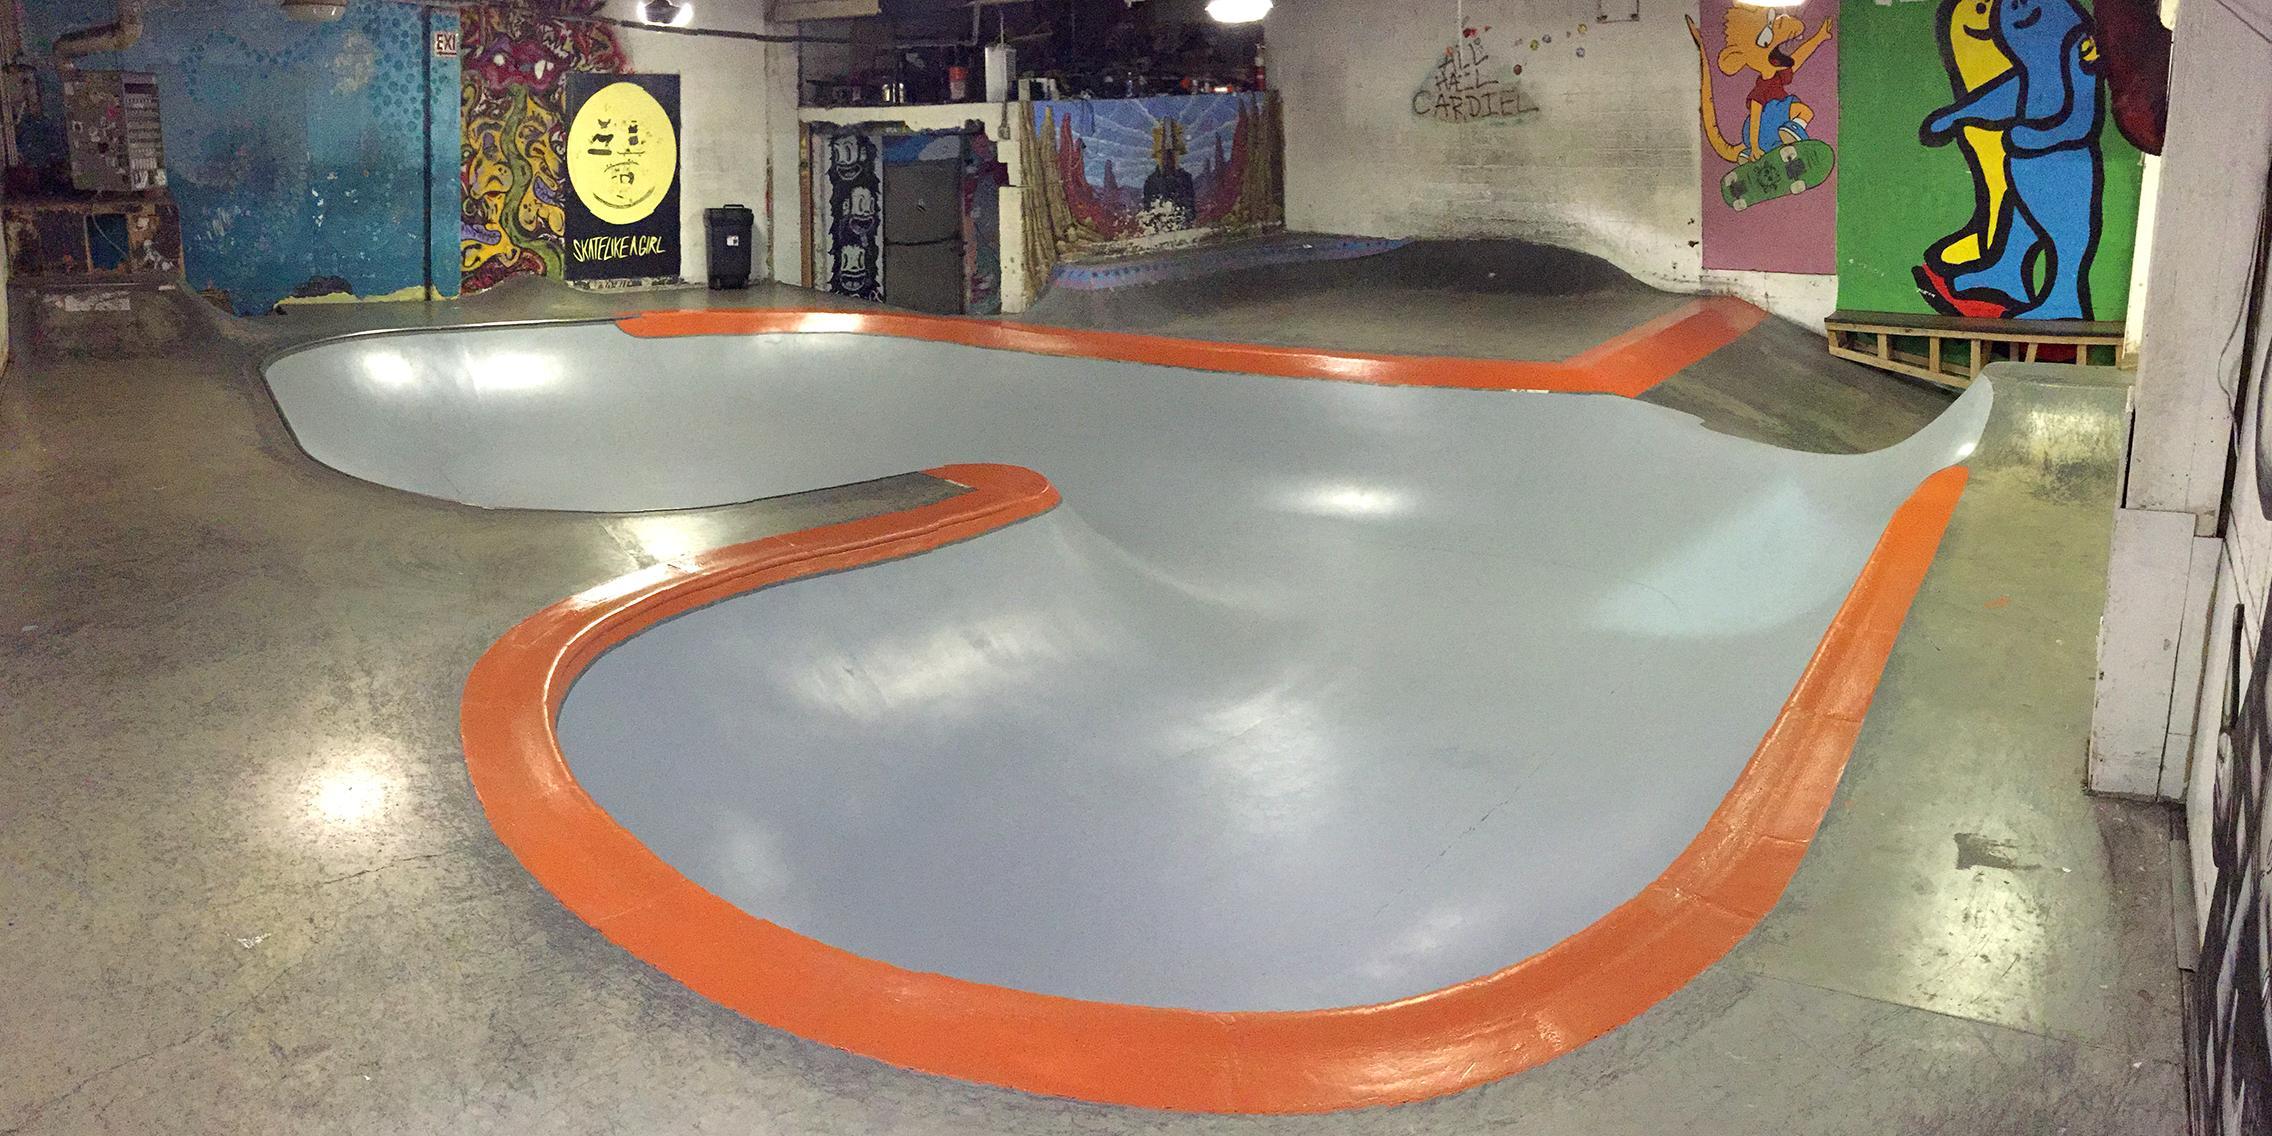 commonwealth skatepark, portland, oregon